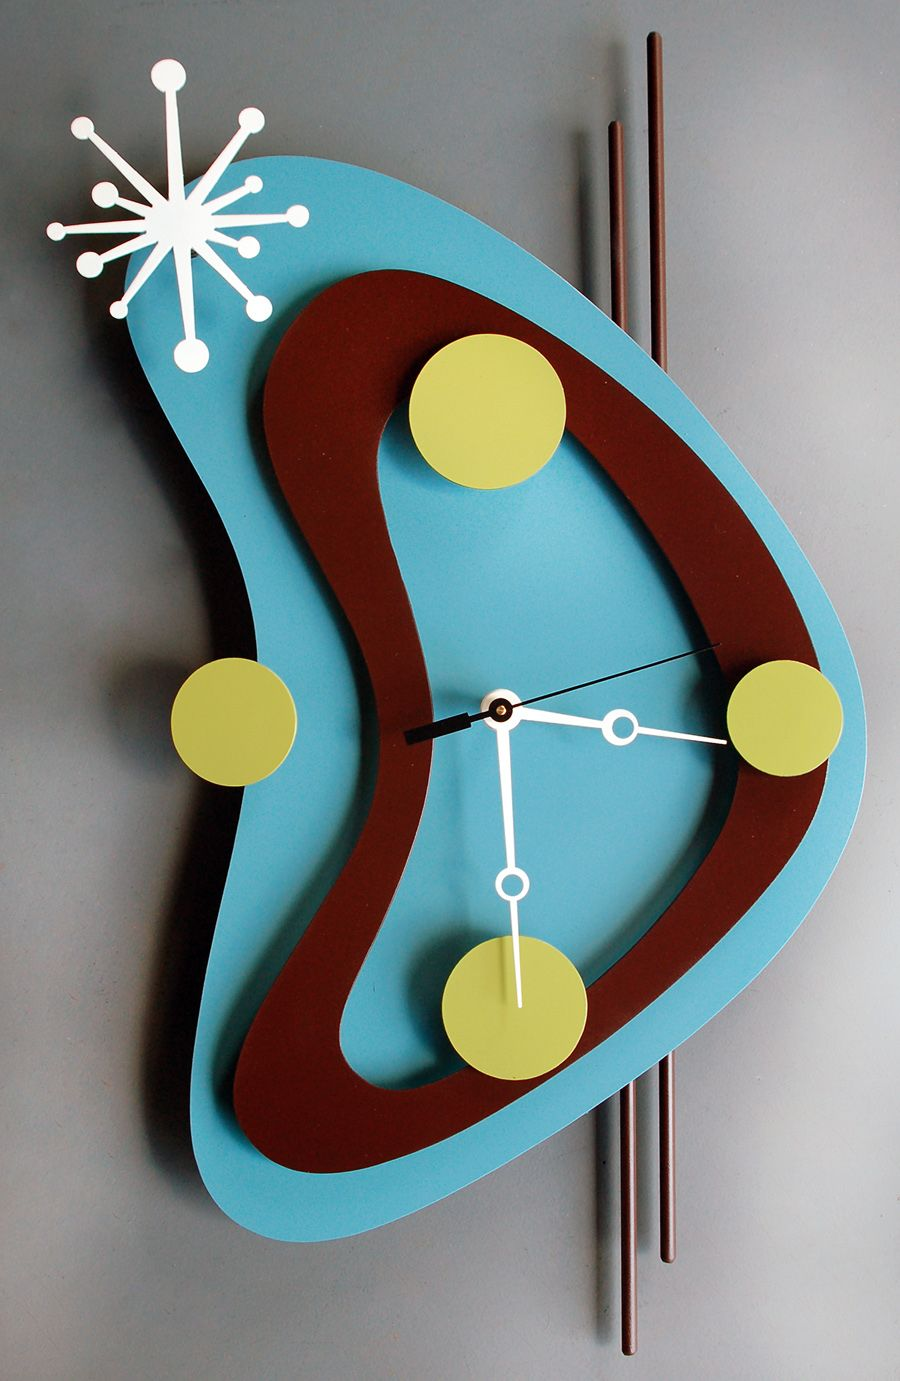 Steveotomics wonderfull clocks relojes modernos reloj reloj originales y relojes modernos - Tiempos modernos muebles ...